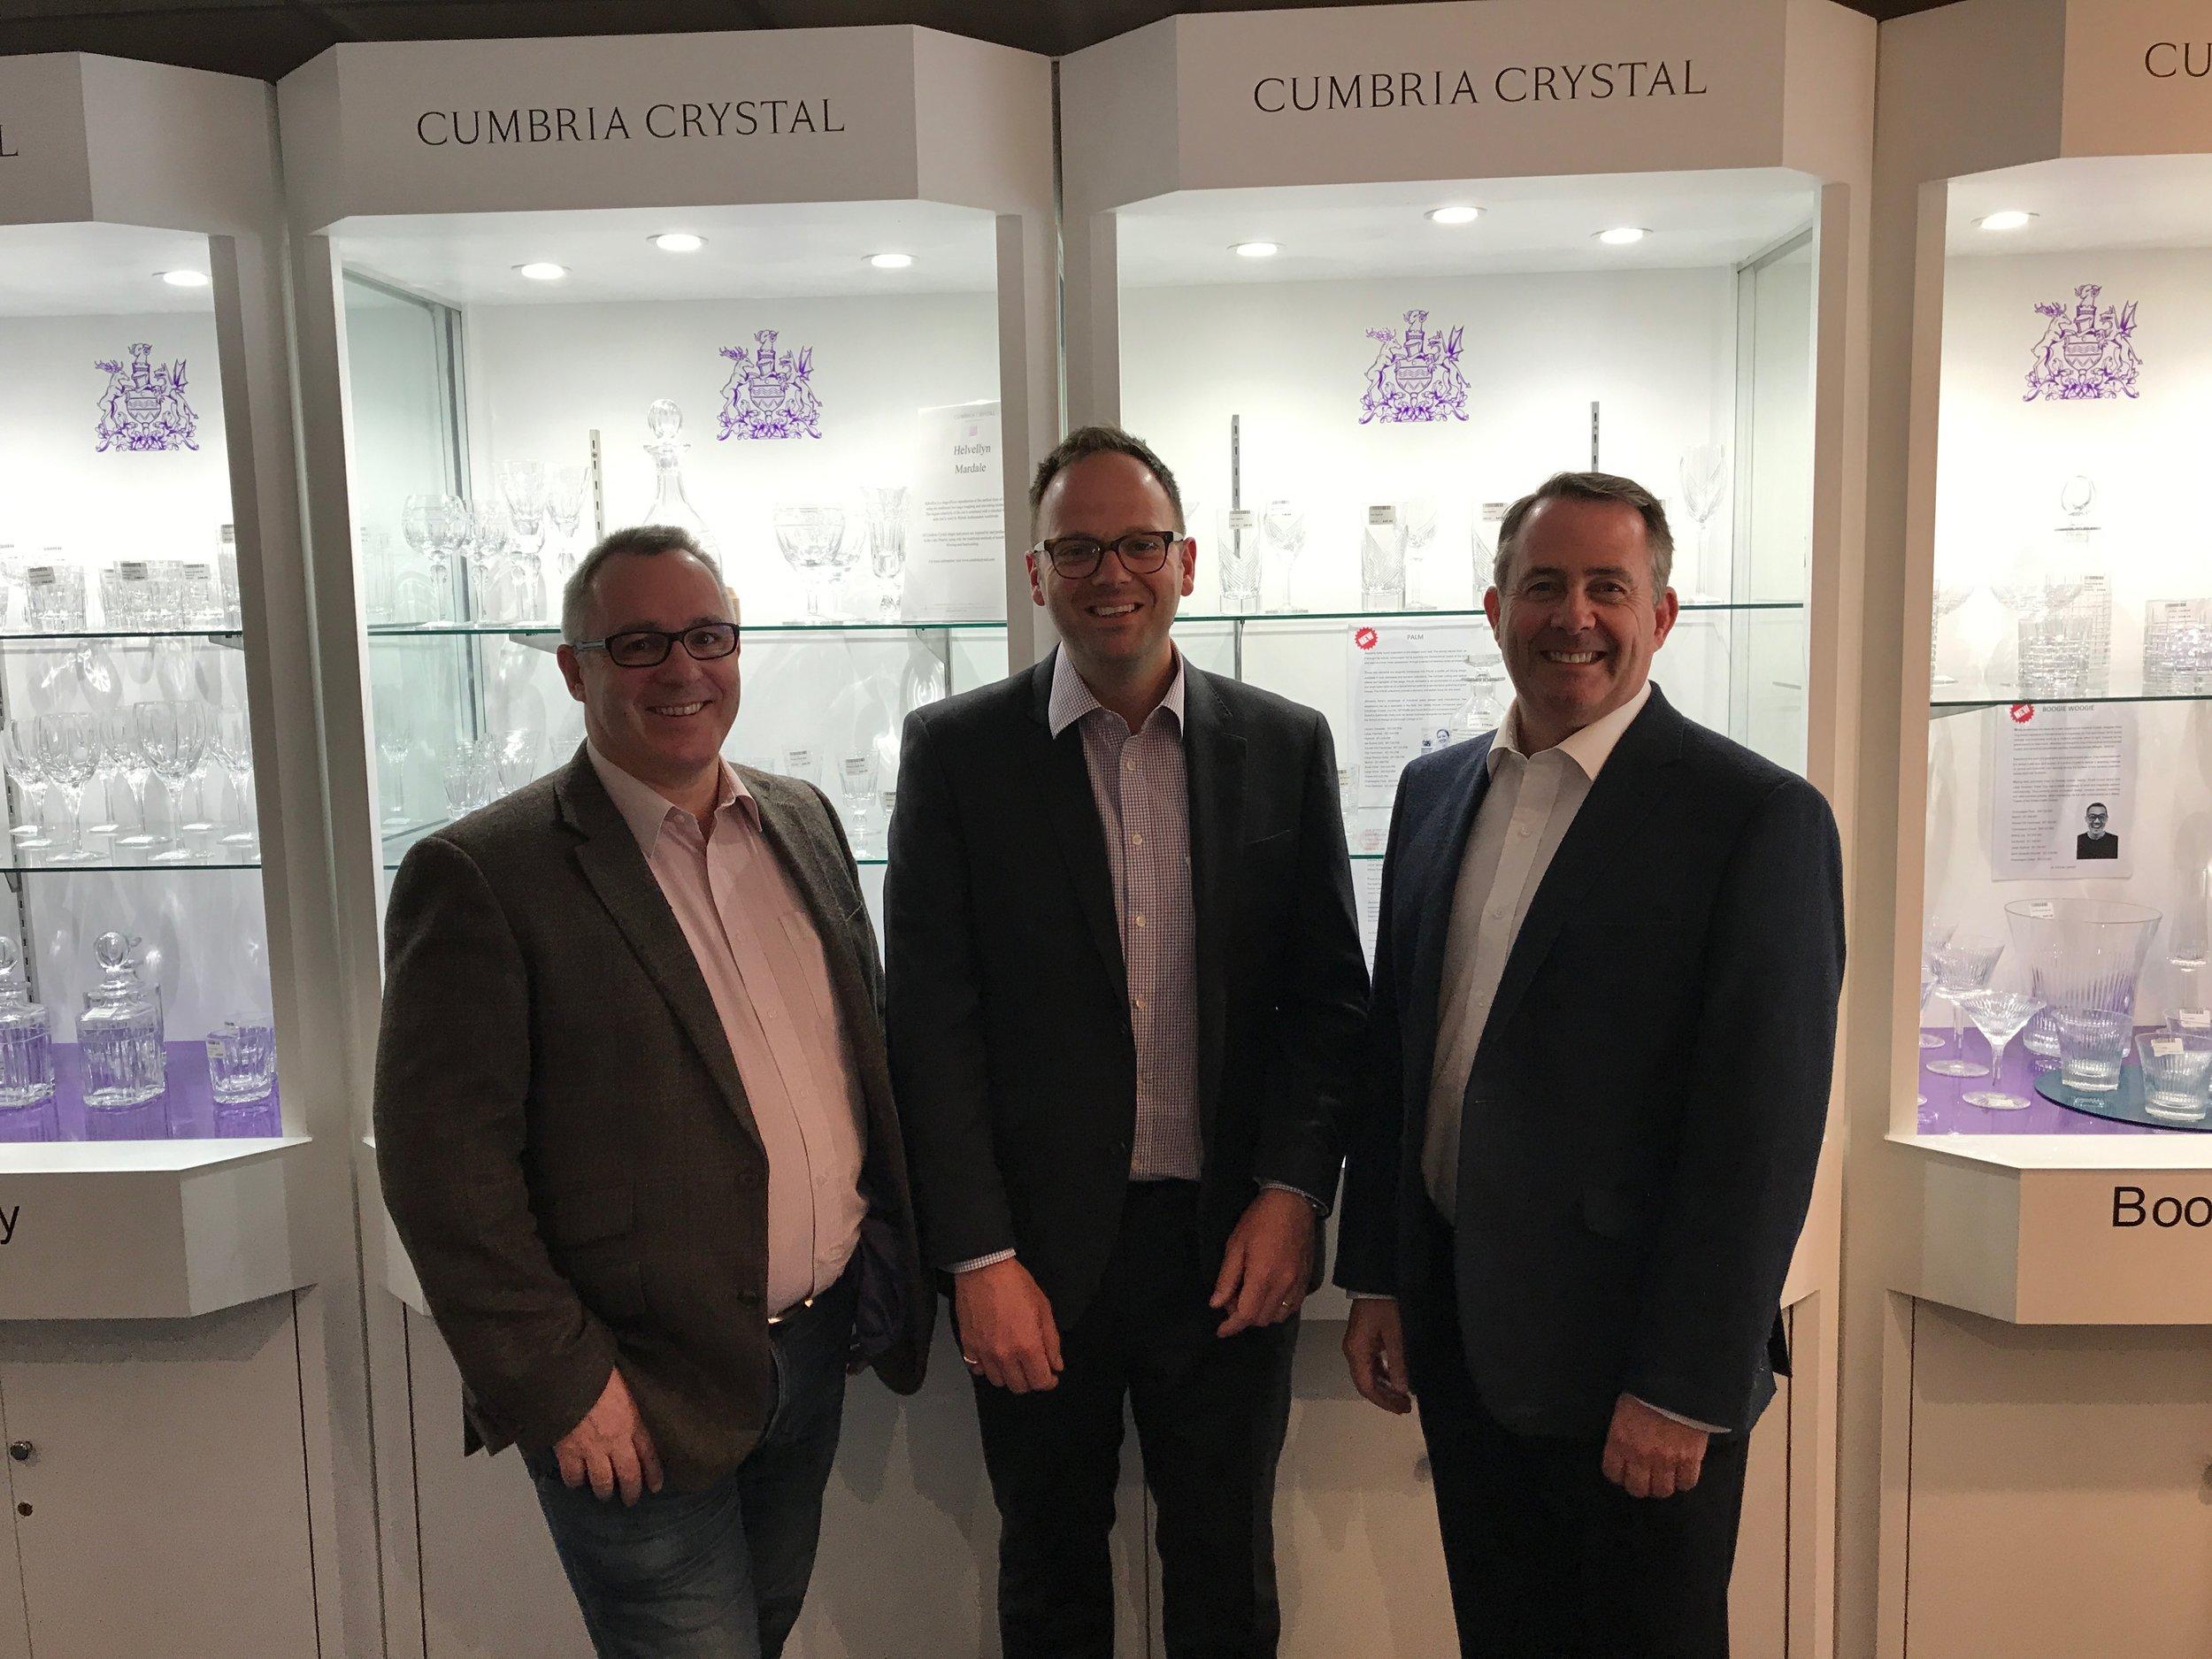 At Cumbria Crystal.